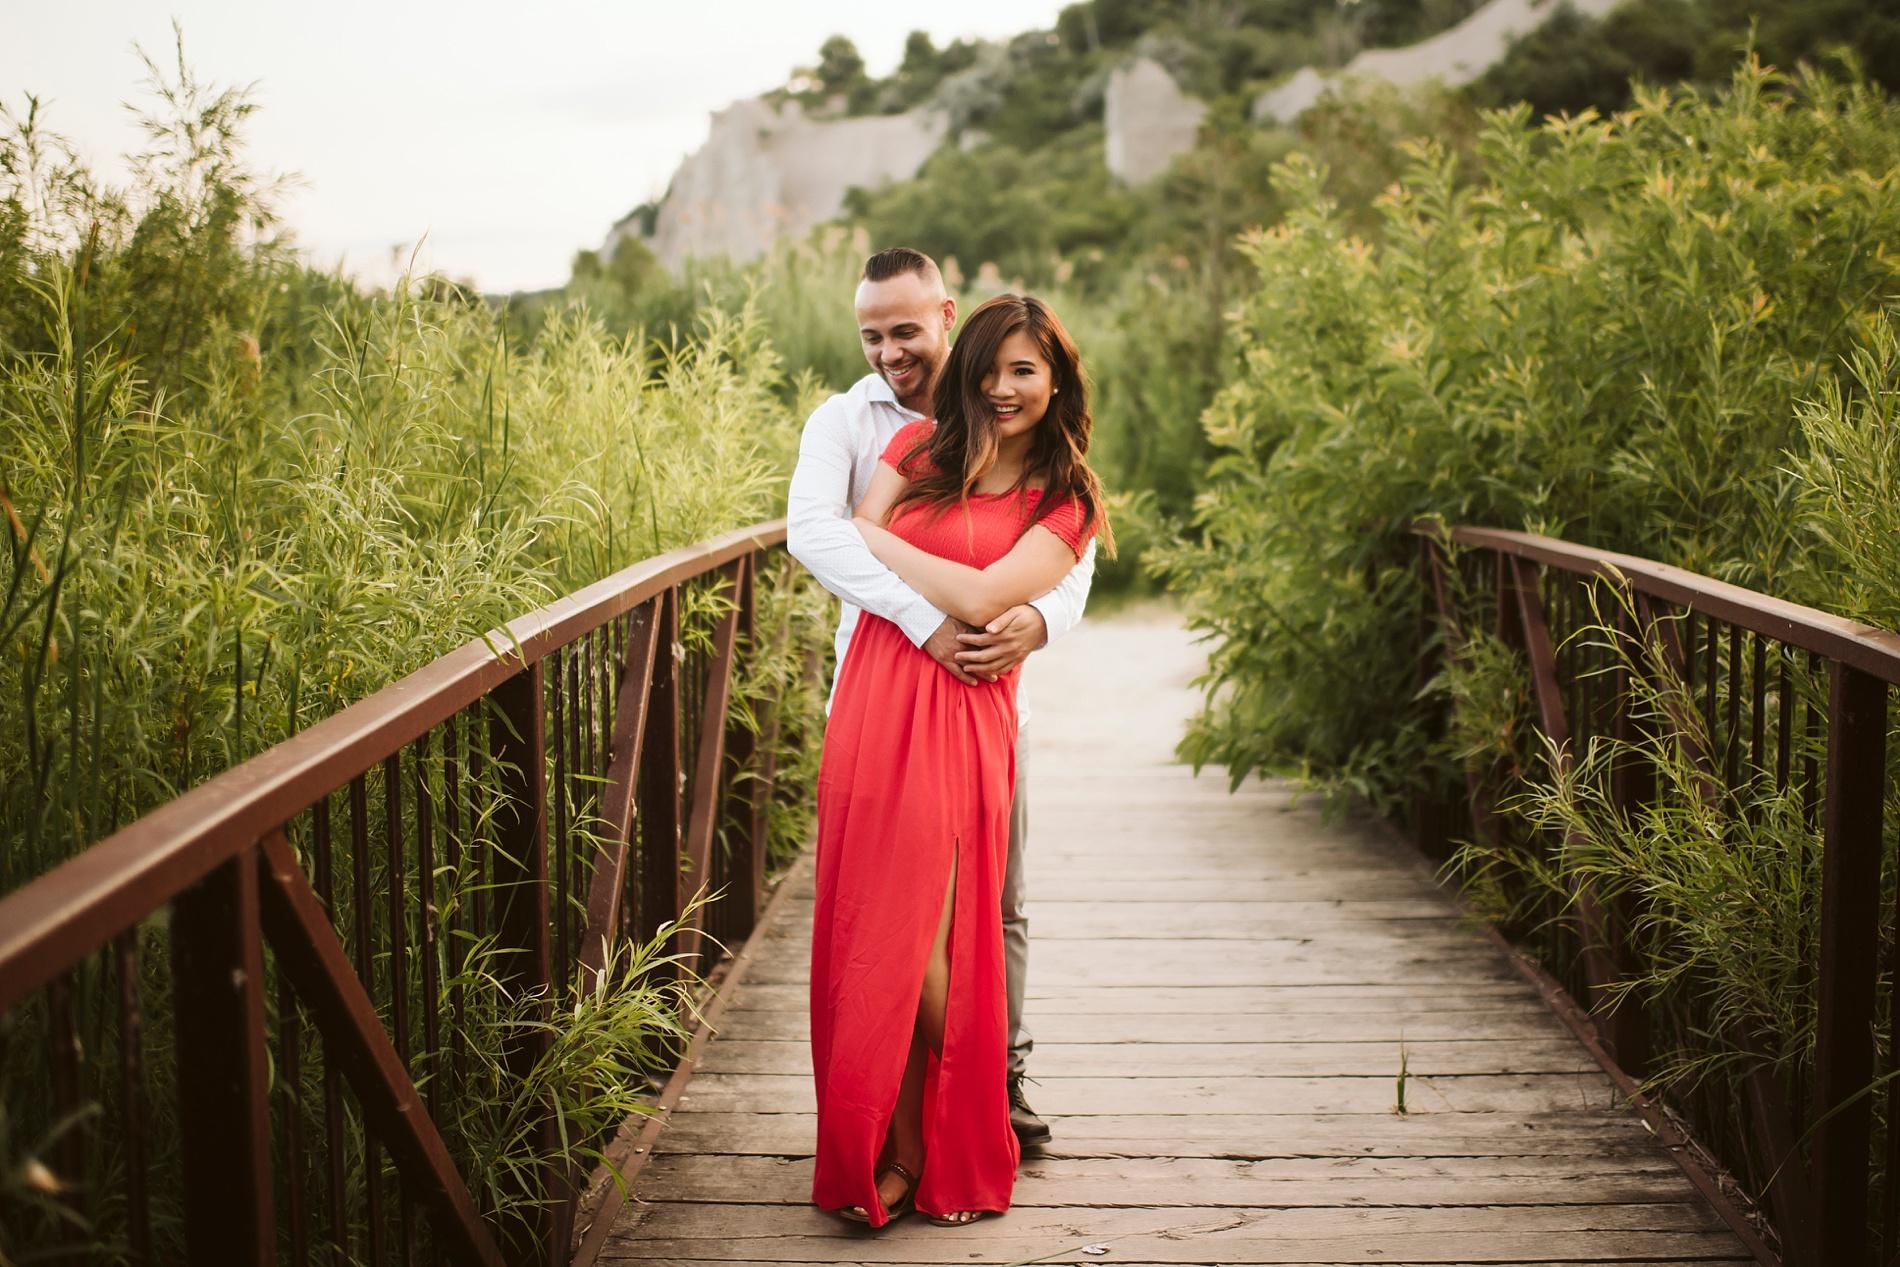 Scarborough_Bluffs_engagement_shoot_Best_Toronto_Wedding_Photographers_0009.jpg